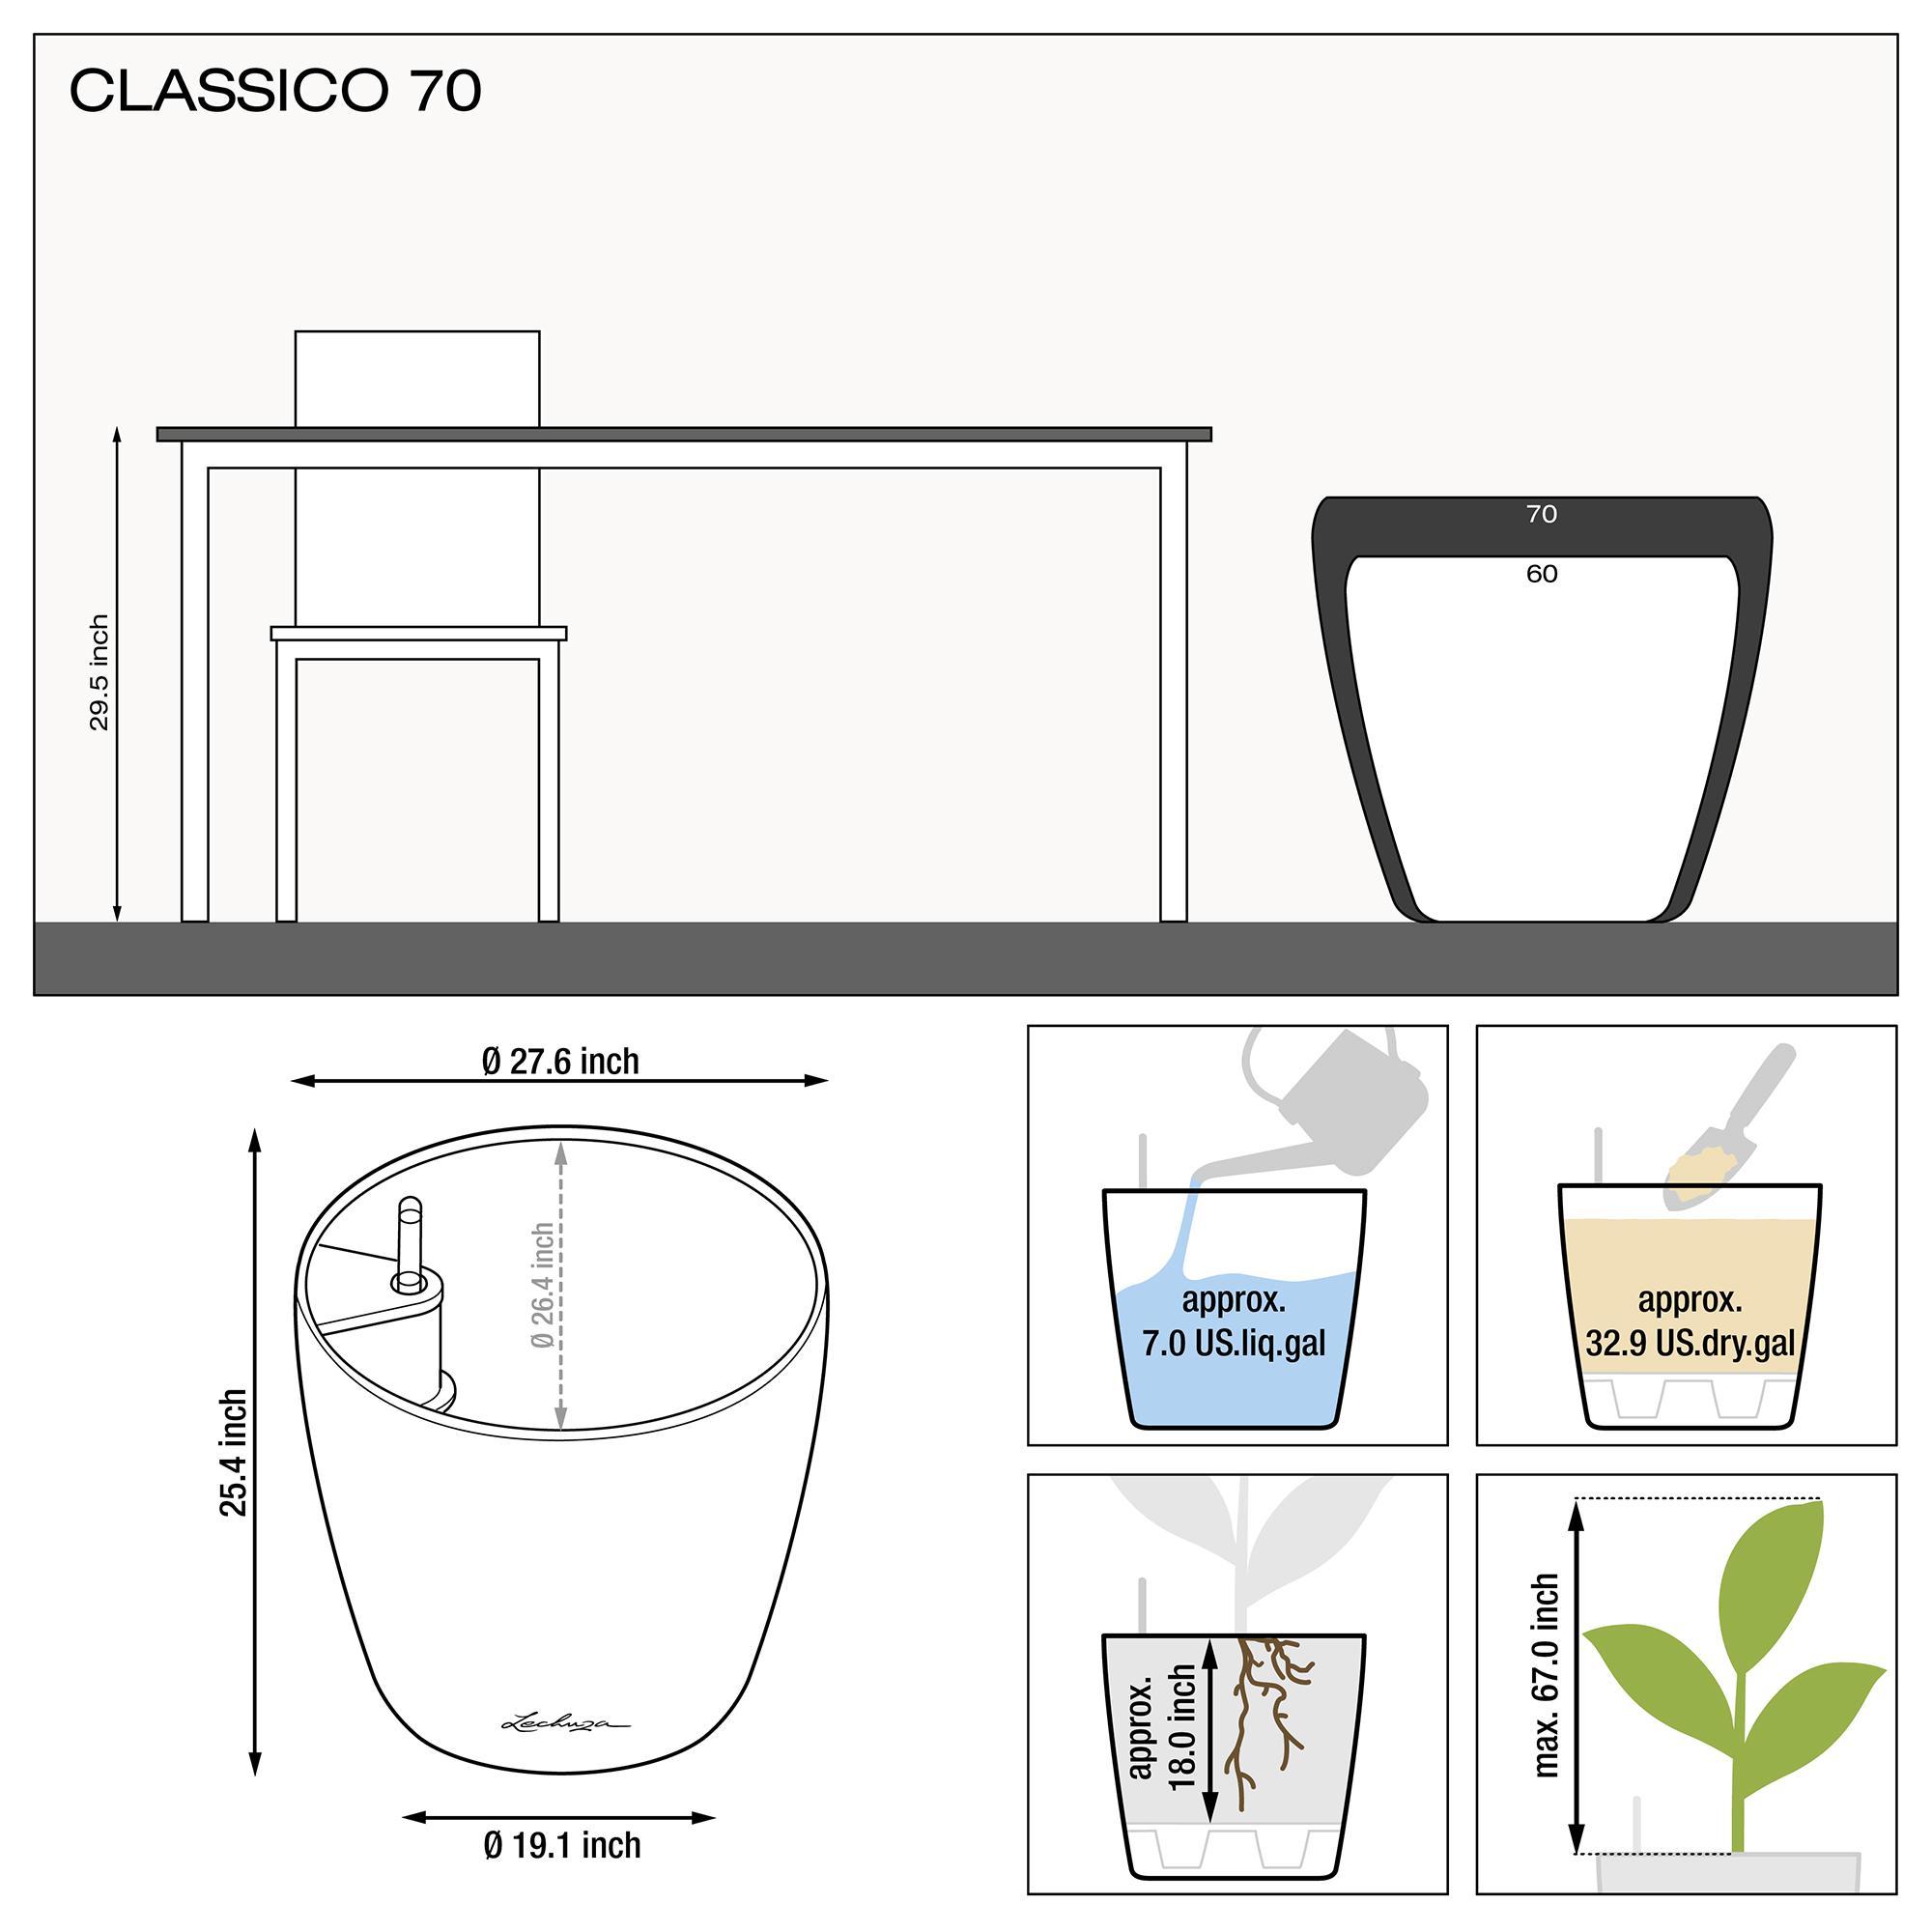 le_classico70_product_addi_nz_us